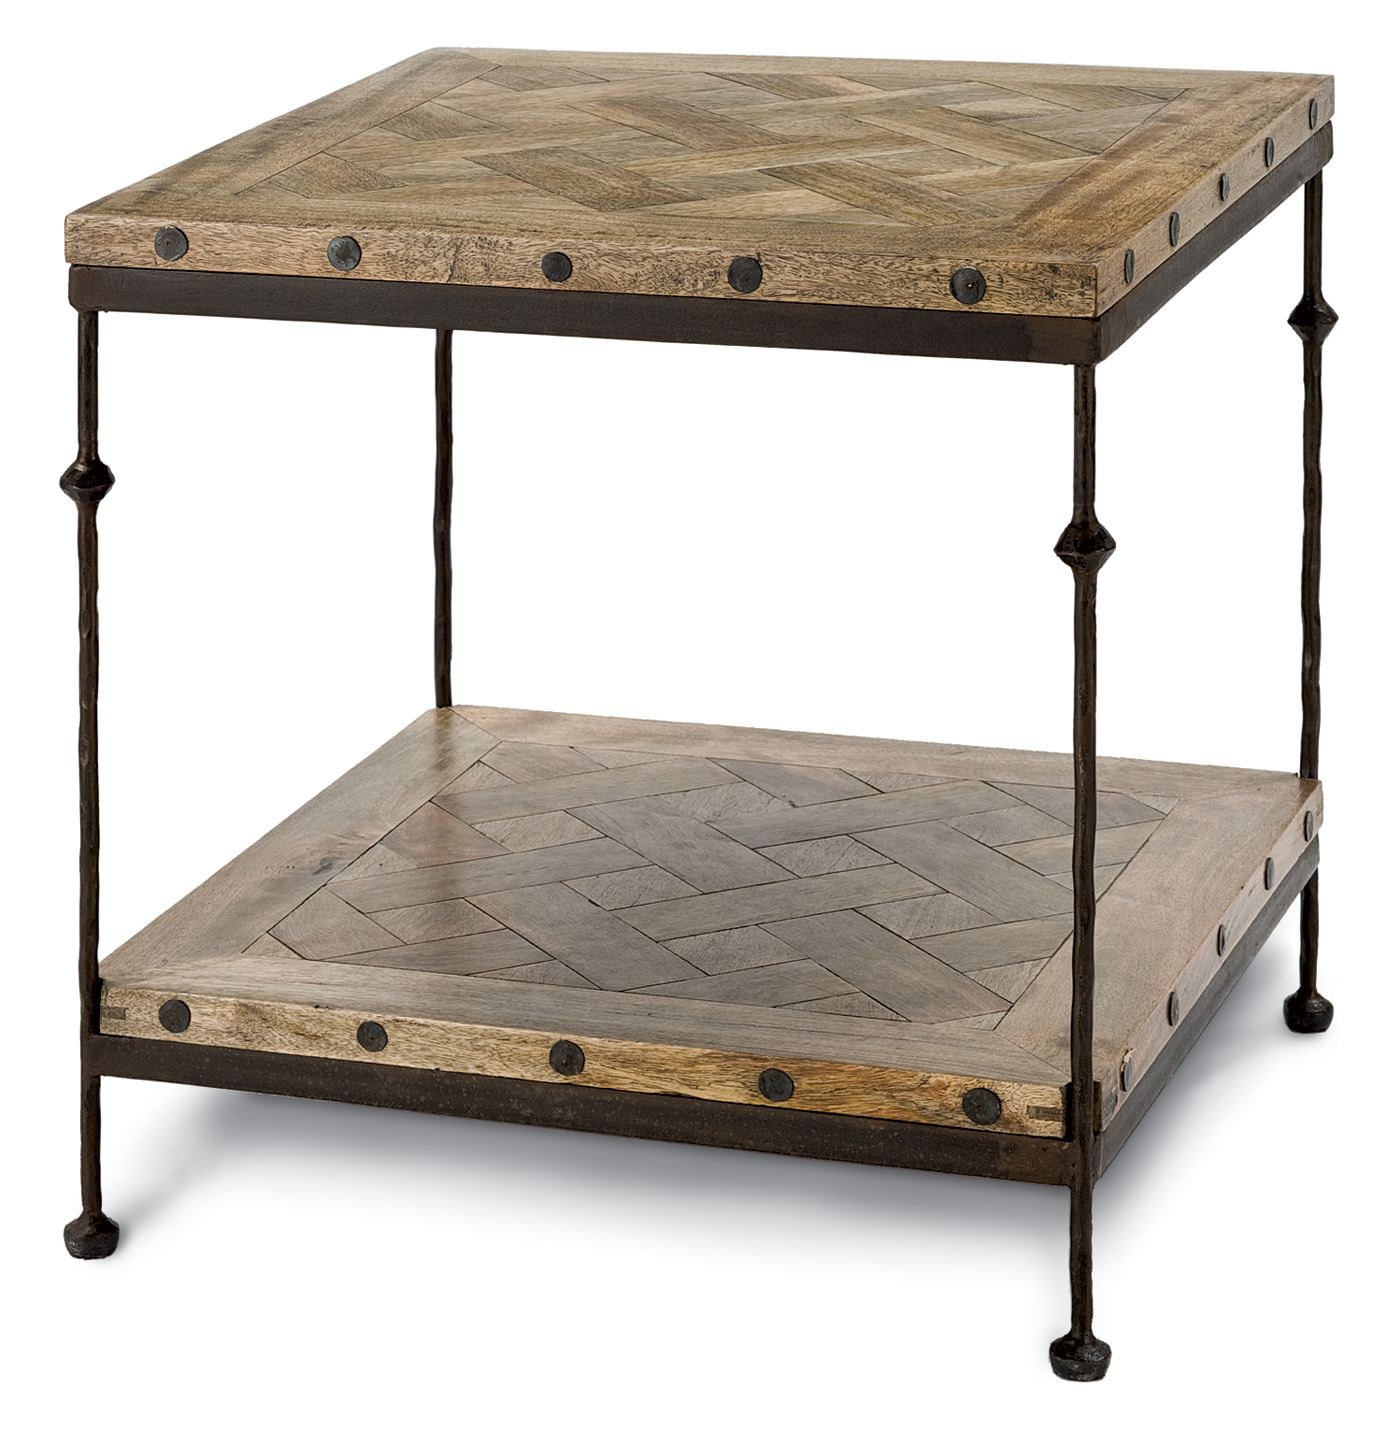 Shays Rustic Mango Wood Parquet Metal Square End Table